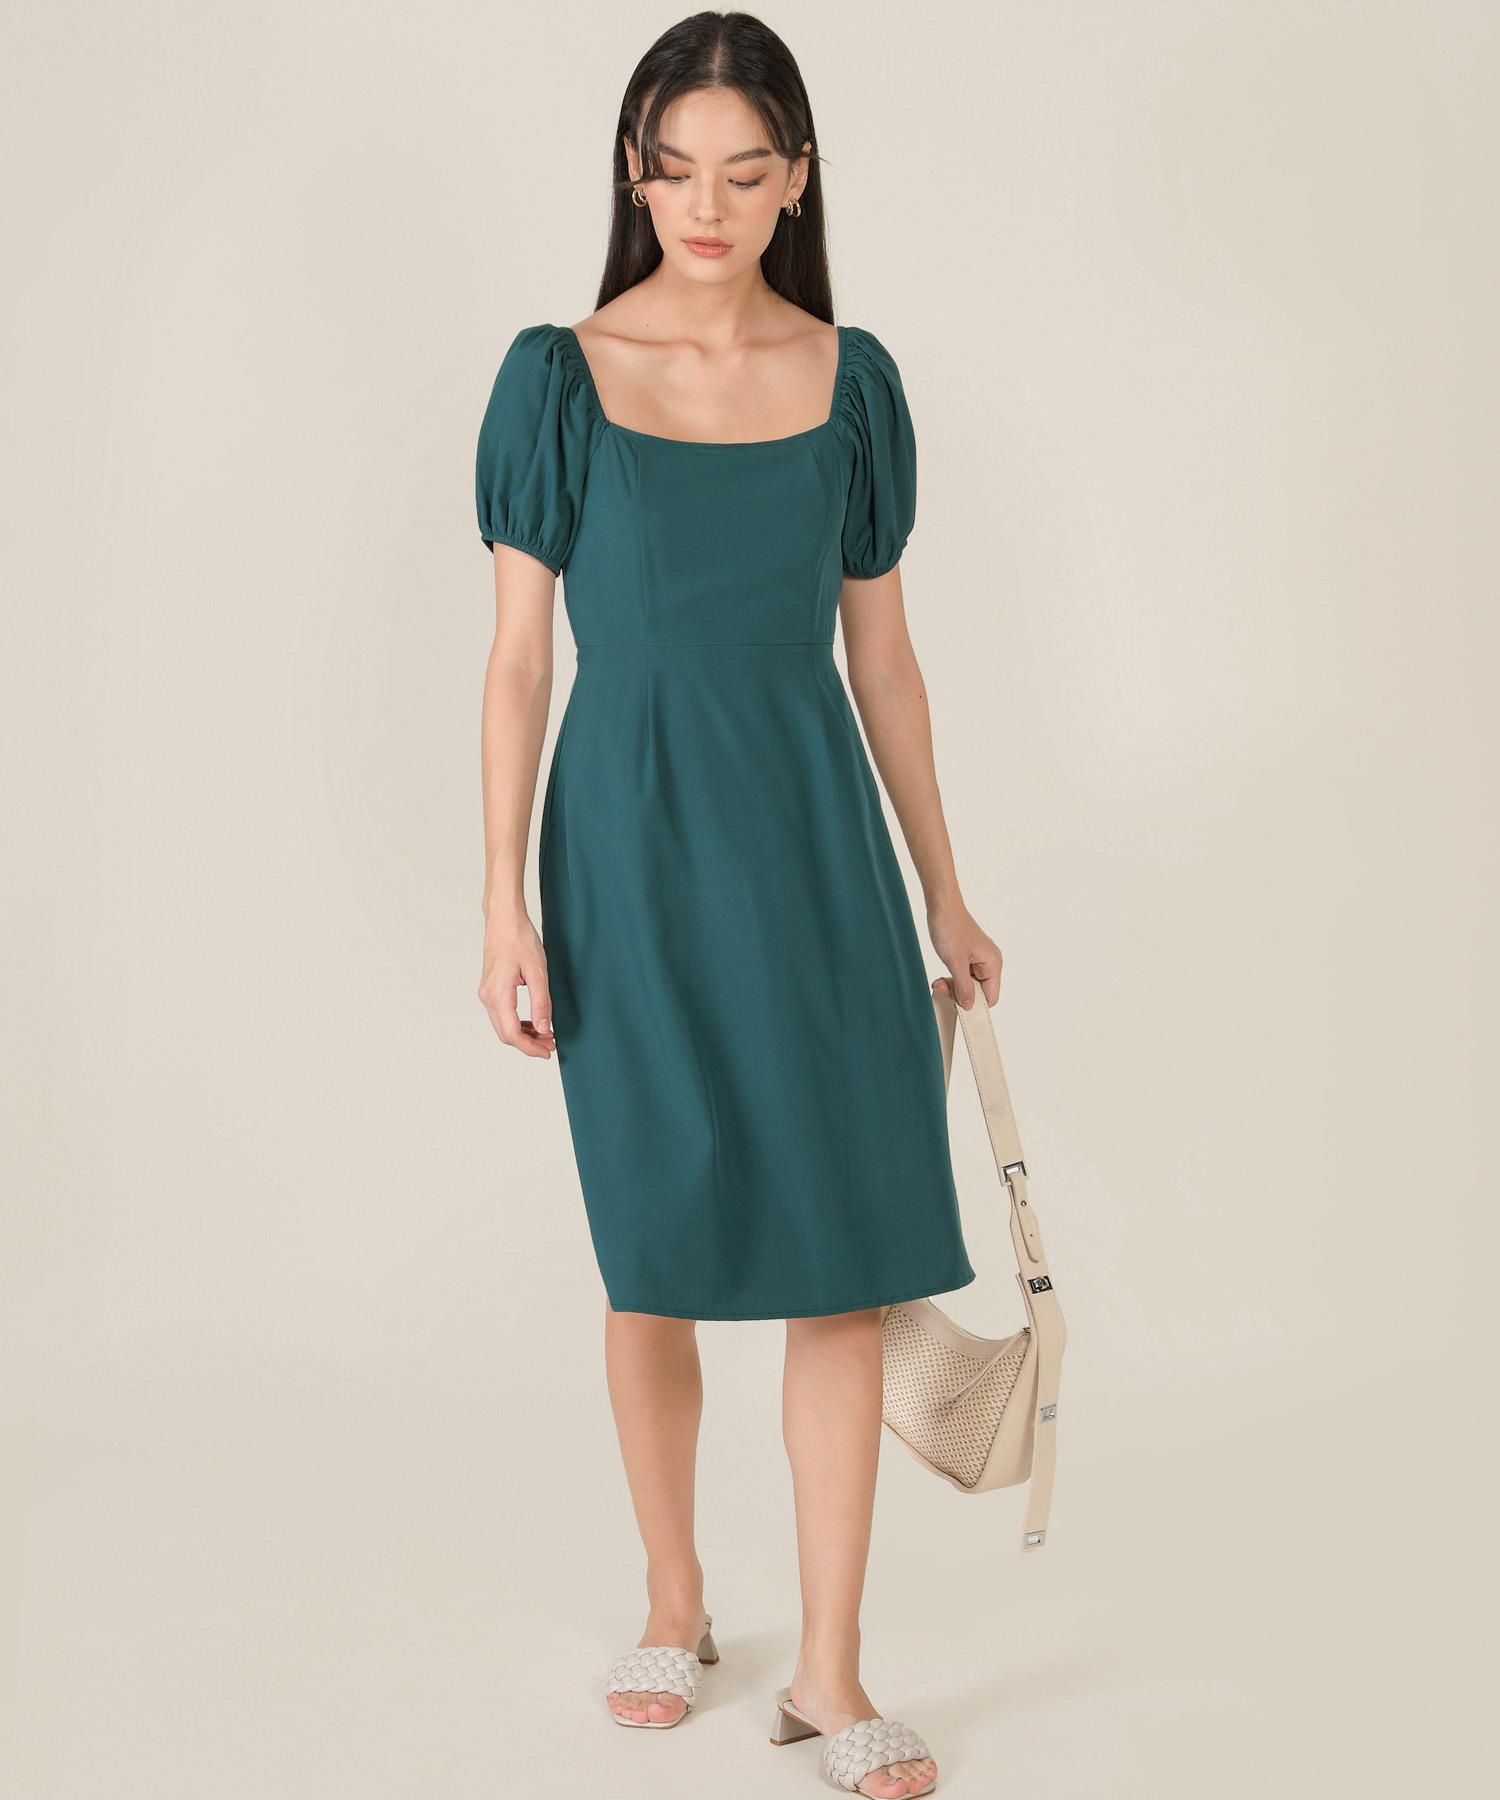 margaux-midi-dress-teal-green-1